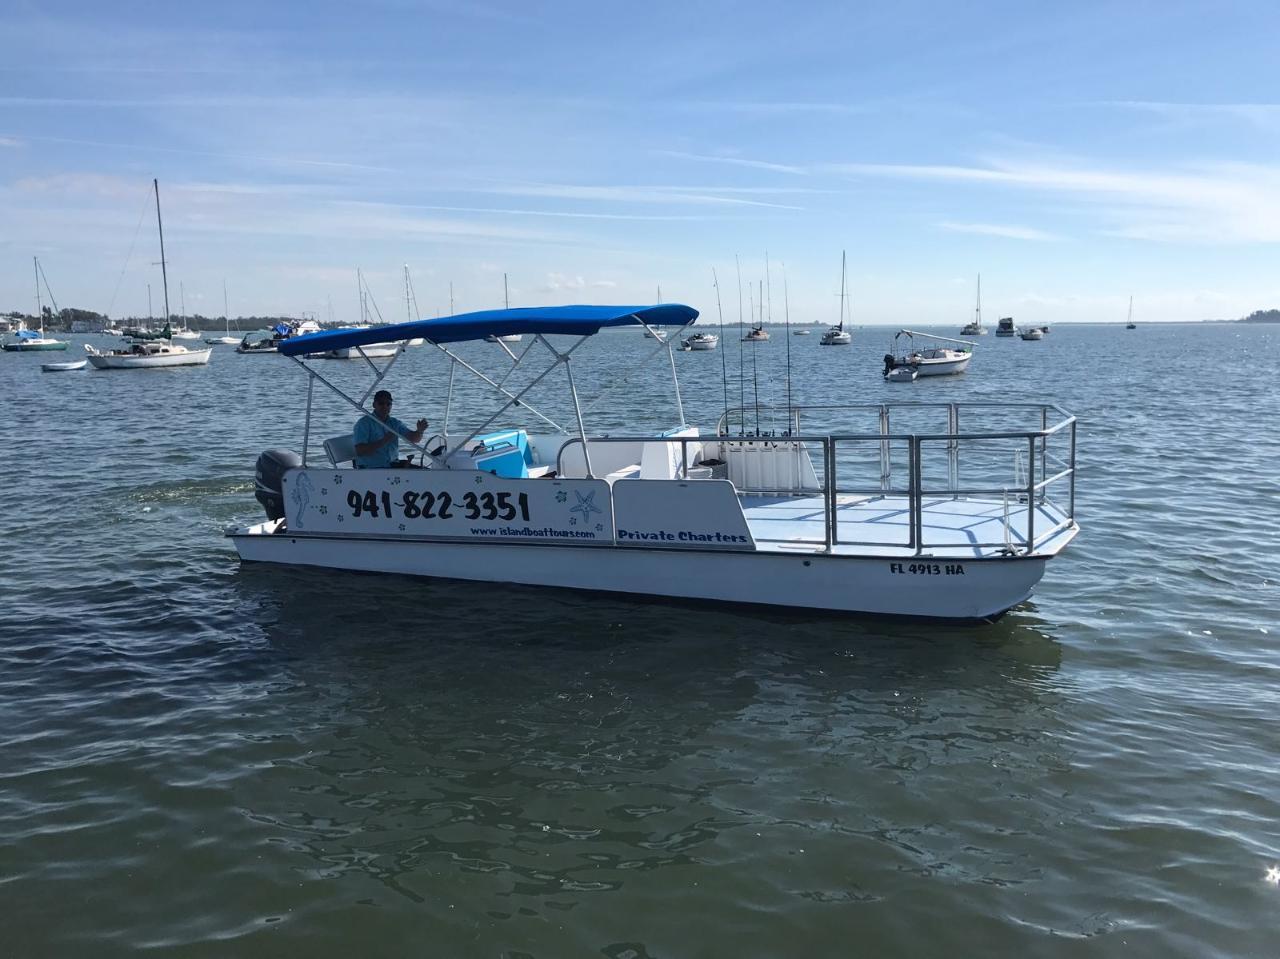 Anna Maria Island Leisure Boat Tour